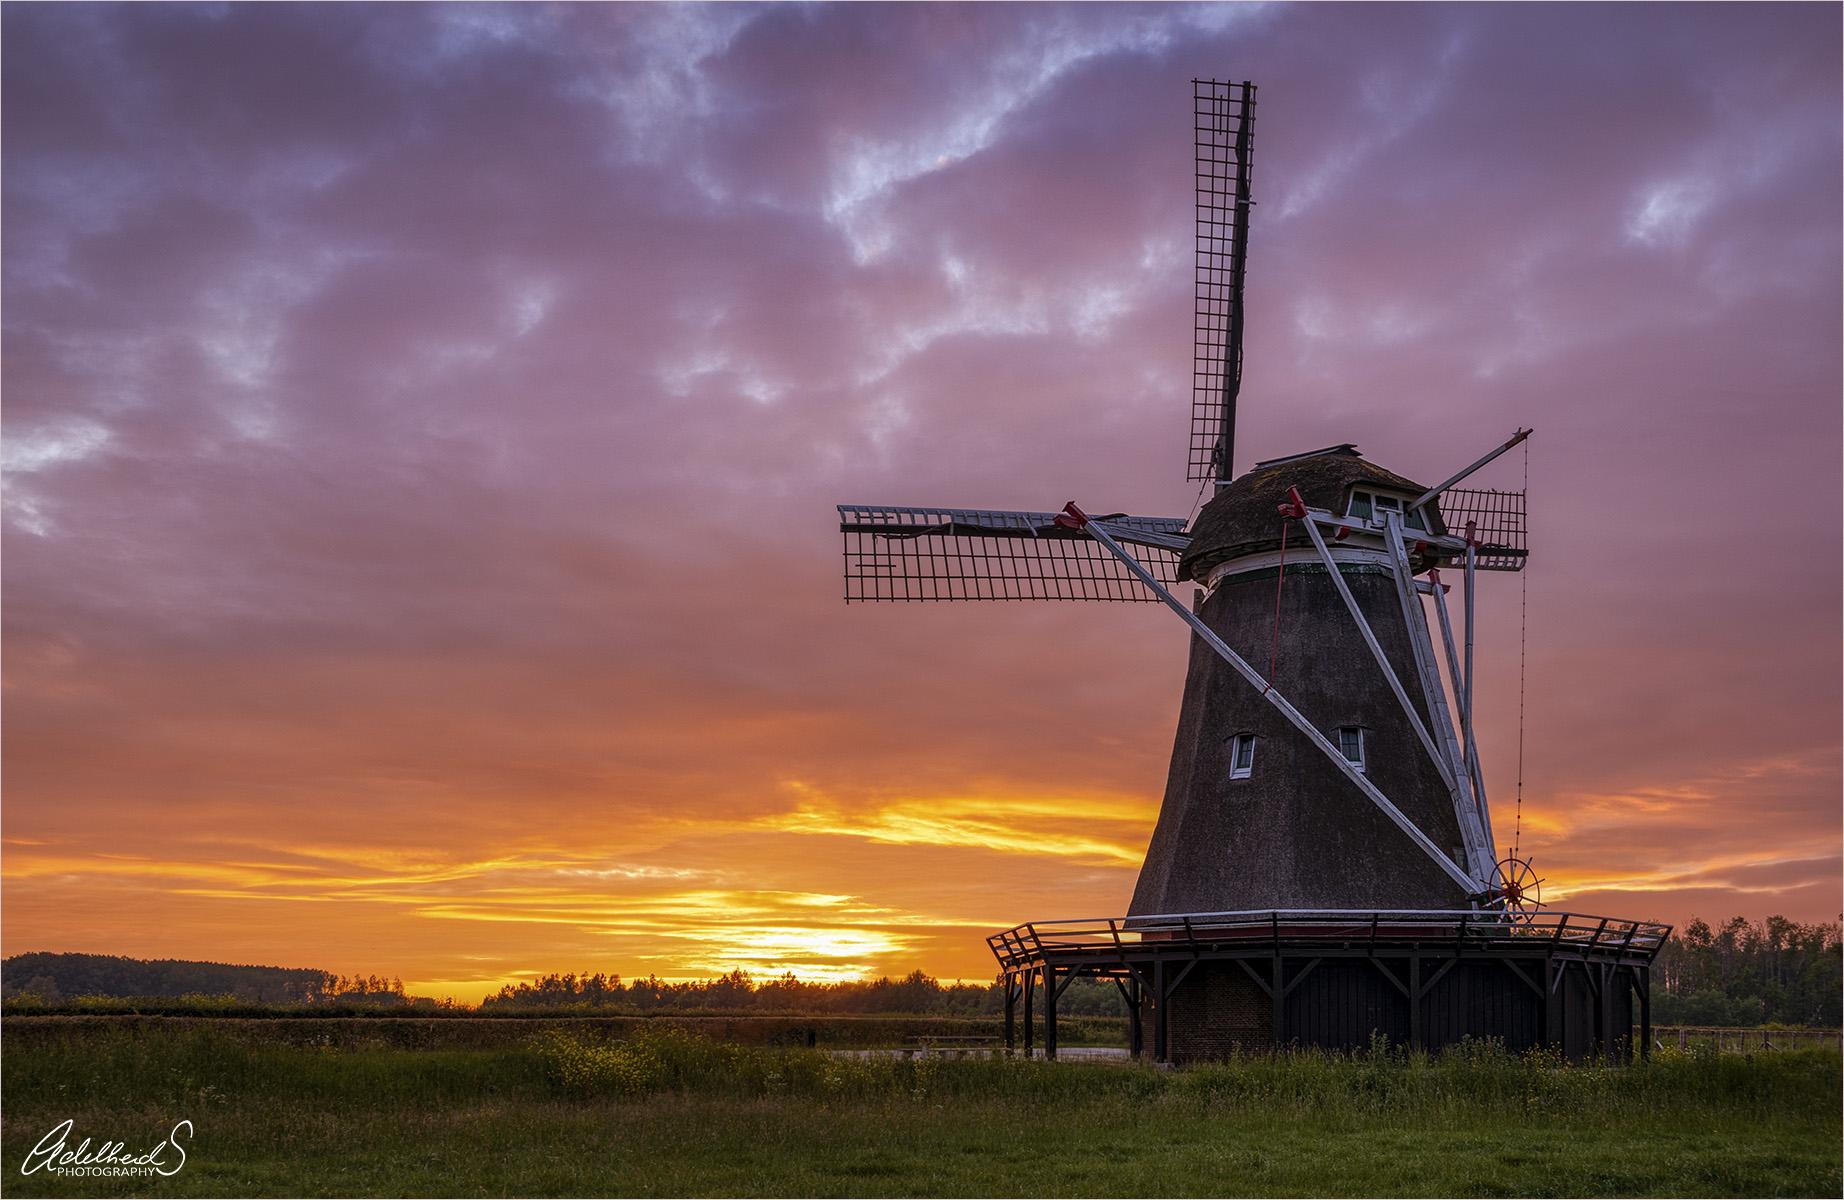 Windesheimer windmill, Netherlands